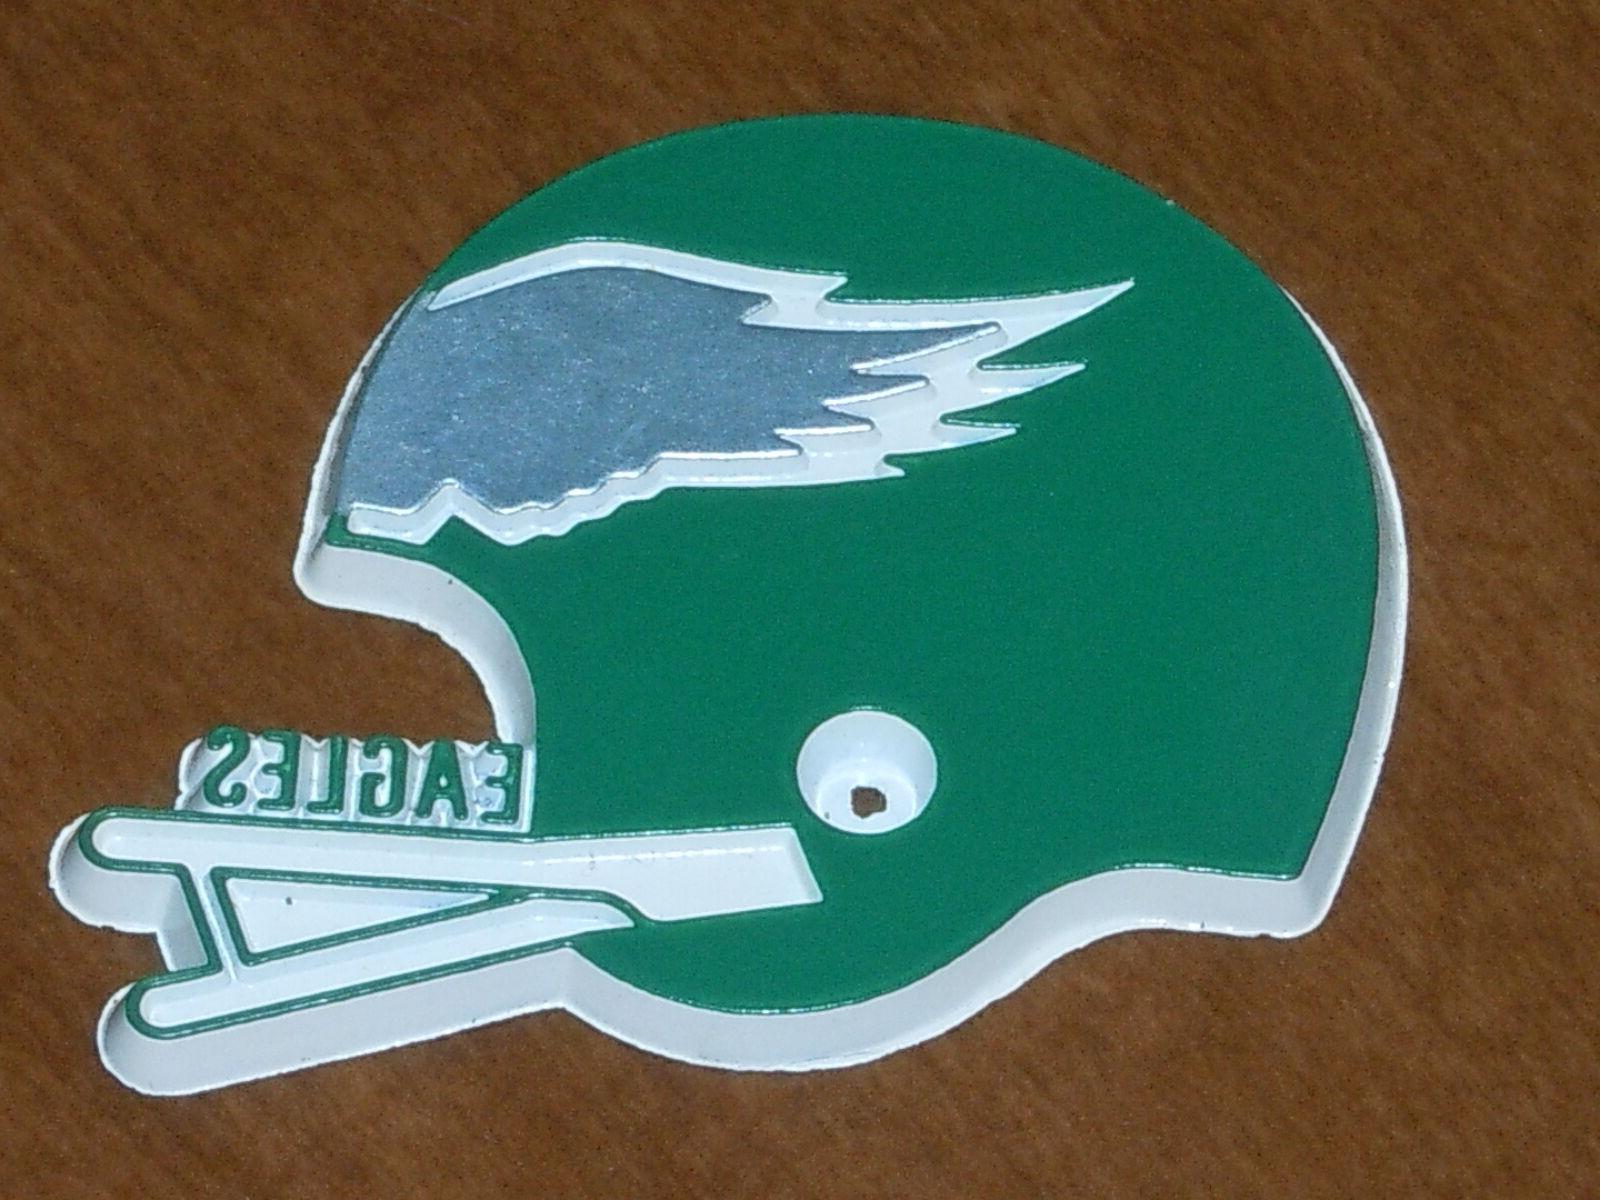 nfl vintage philadelphia eagles rubber football fridge